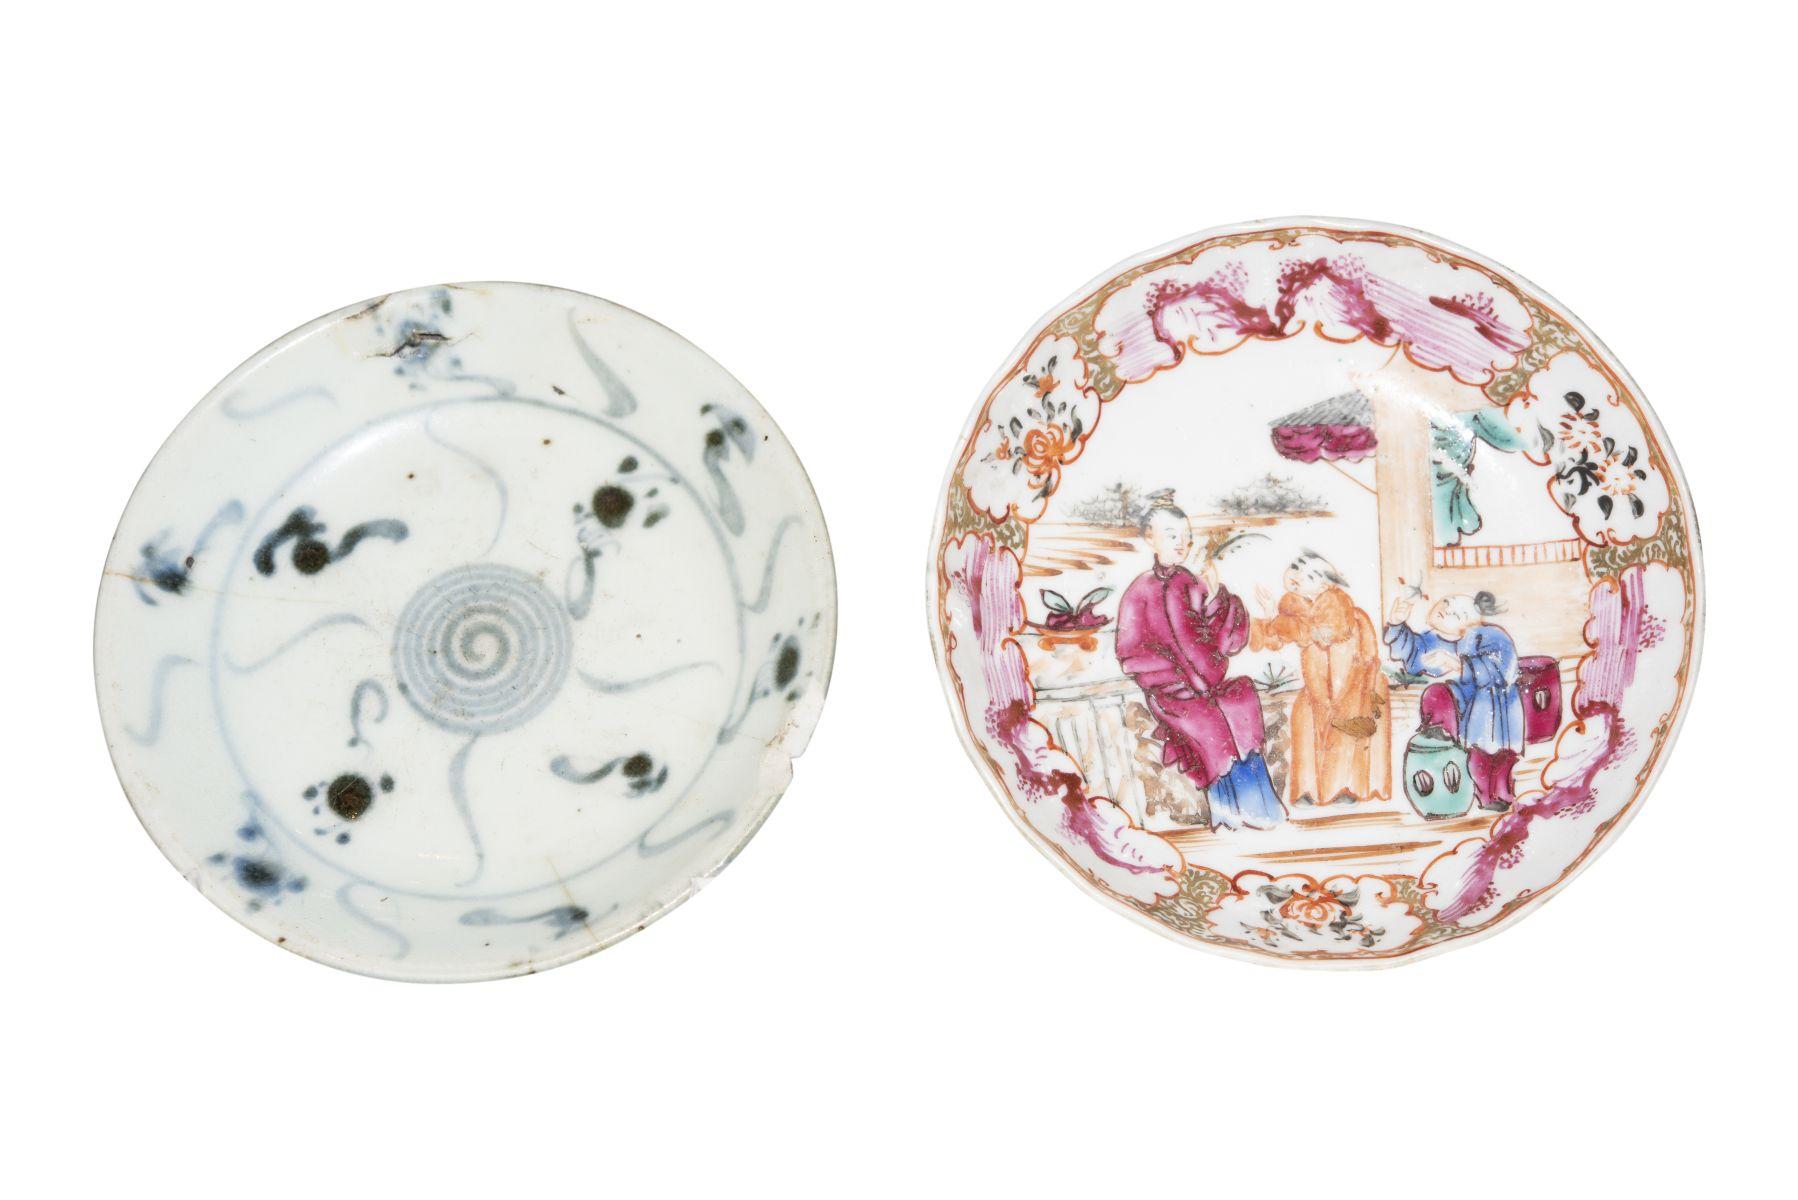 #77 2 small plates Qing Dynasty | 2 kleine Teller Qing Dynastie Image